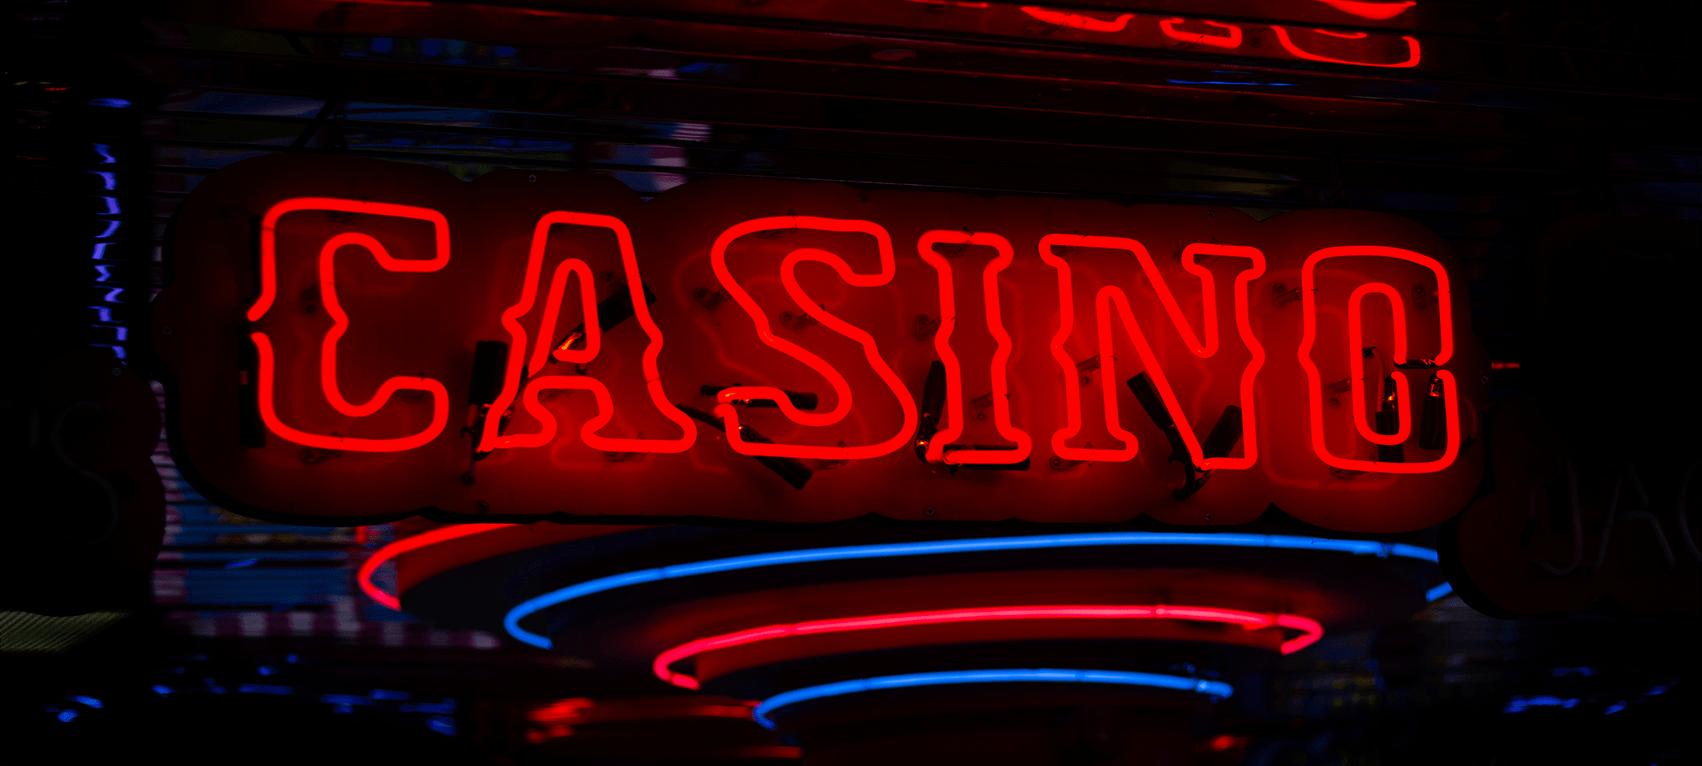 https://www.gambleonline.co/app/uploads/2021/03/casino-news-ft-image-1-1.png